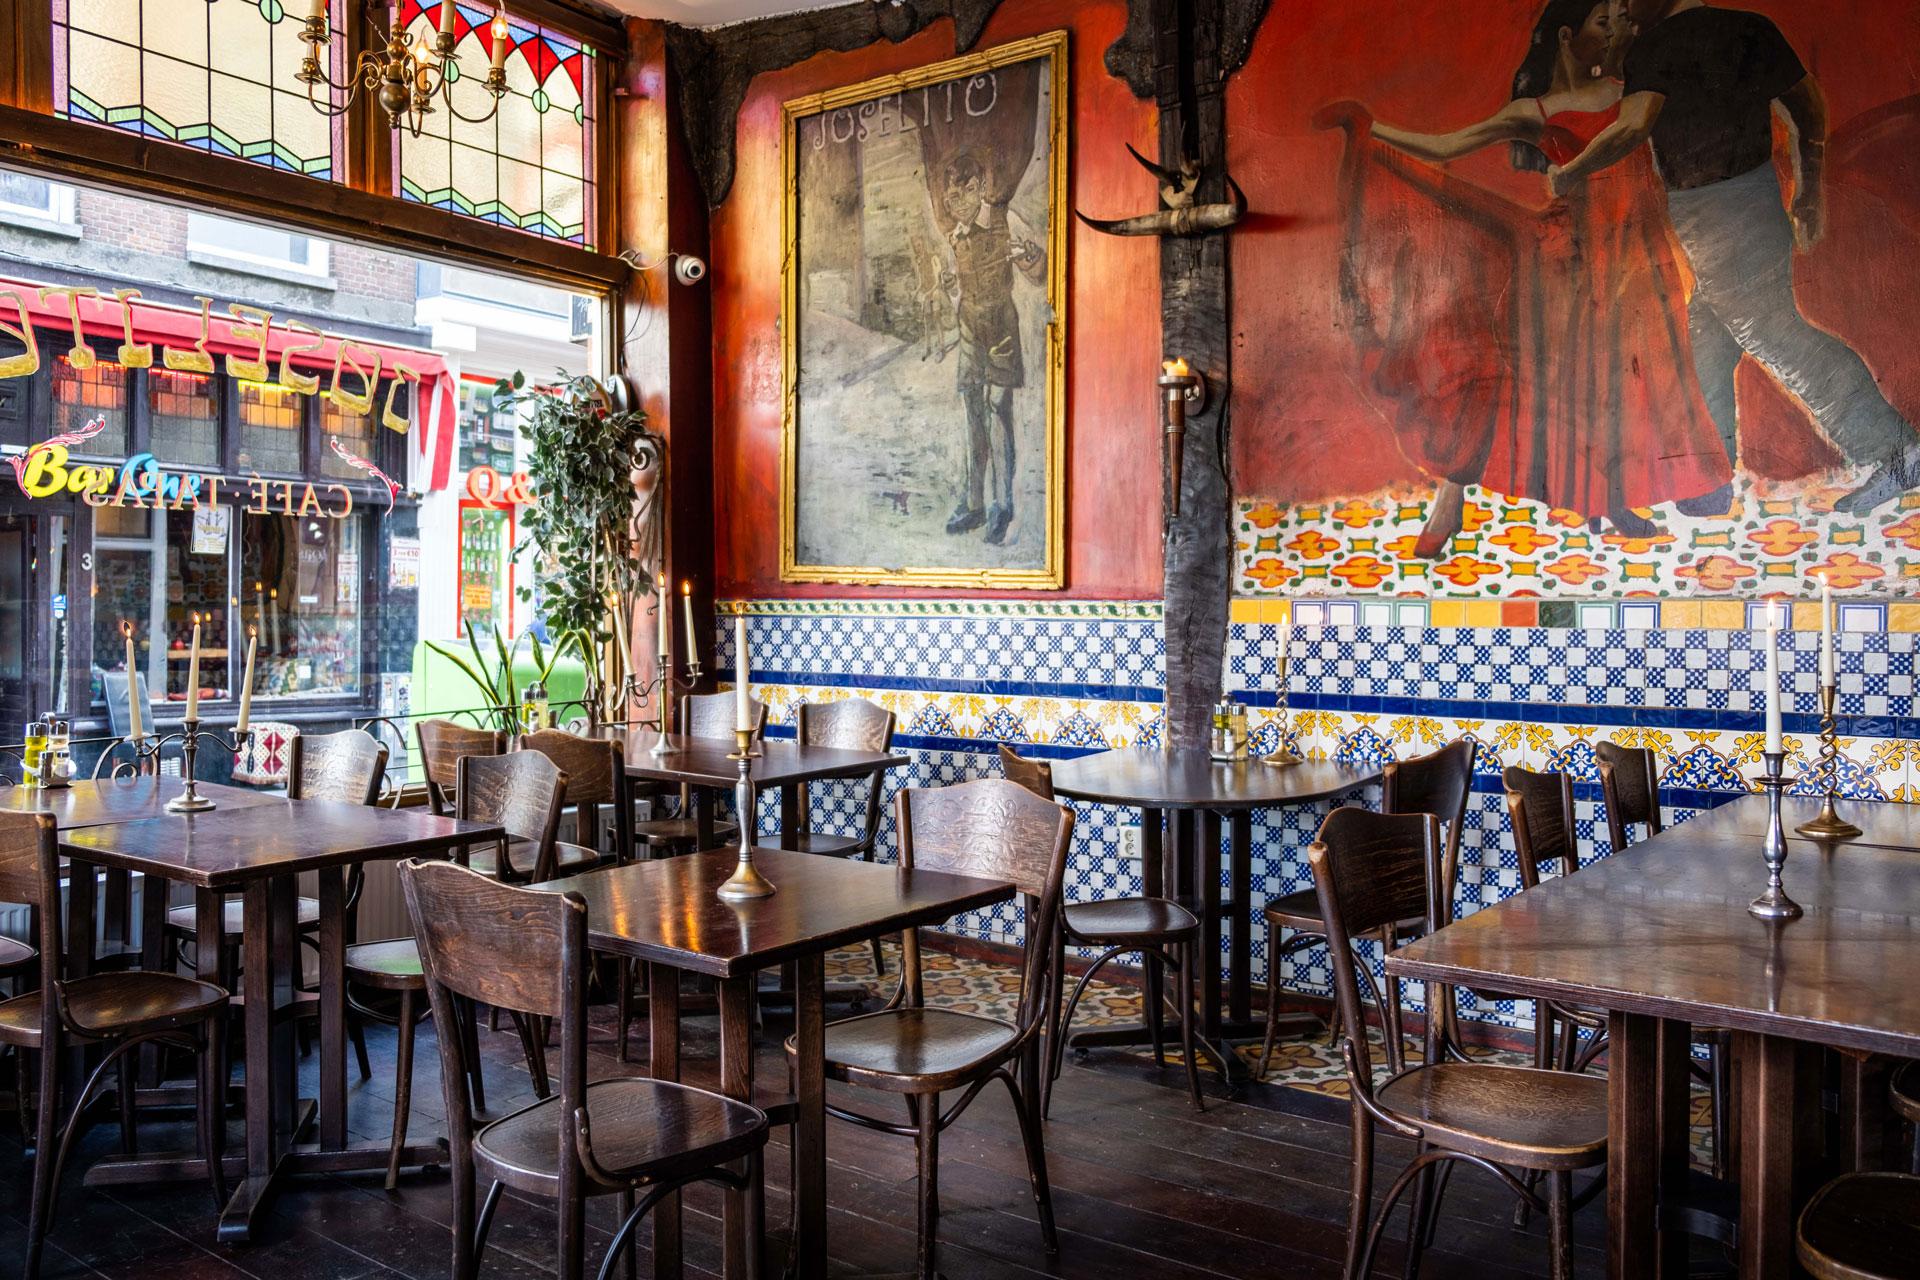 Cafe-Joselito-Credits.Vere-Maagdenberg-21